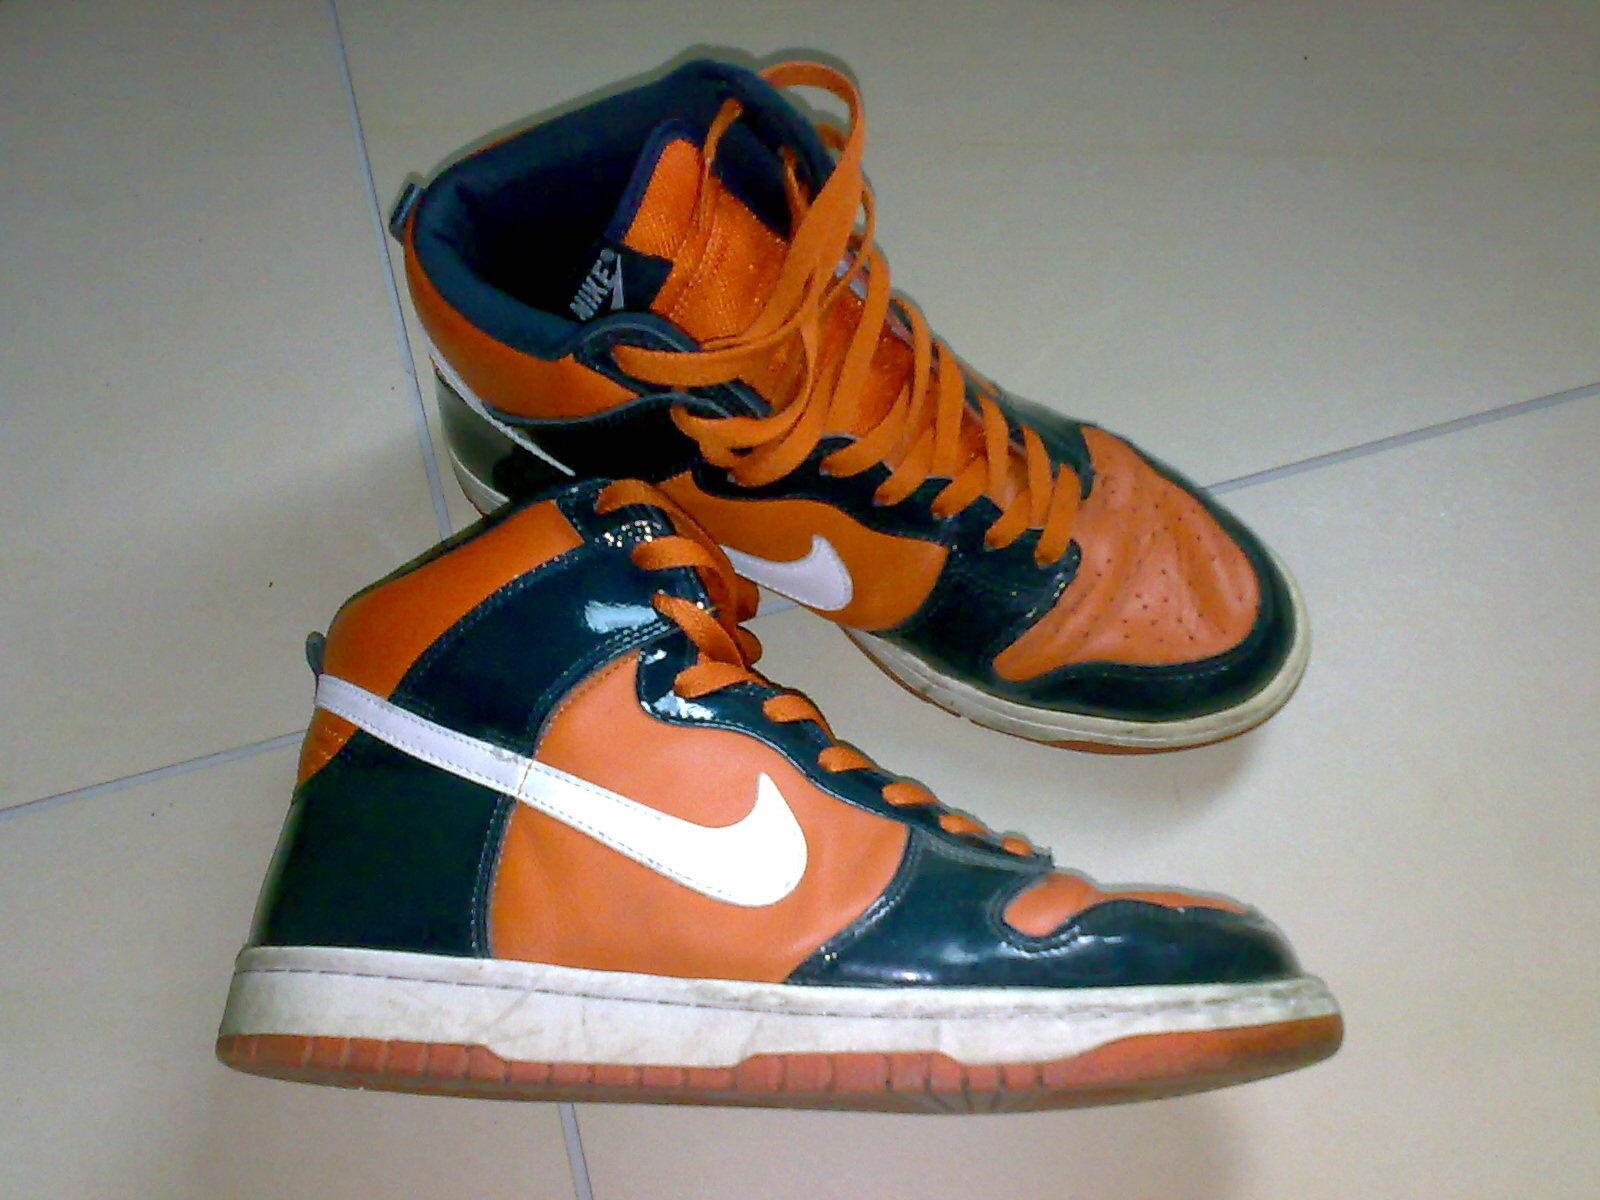 Nike Air Dunk High Gr. 44 BLAU- Orange Orange Orange SYRACRUSE 0793e7